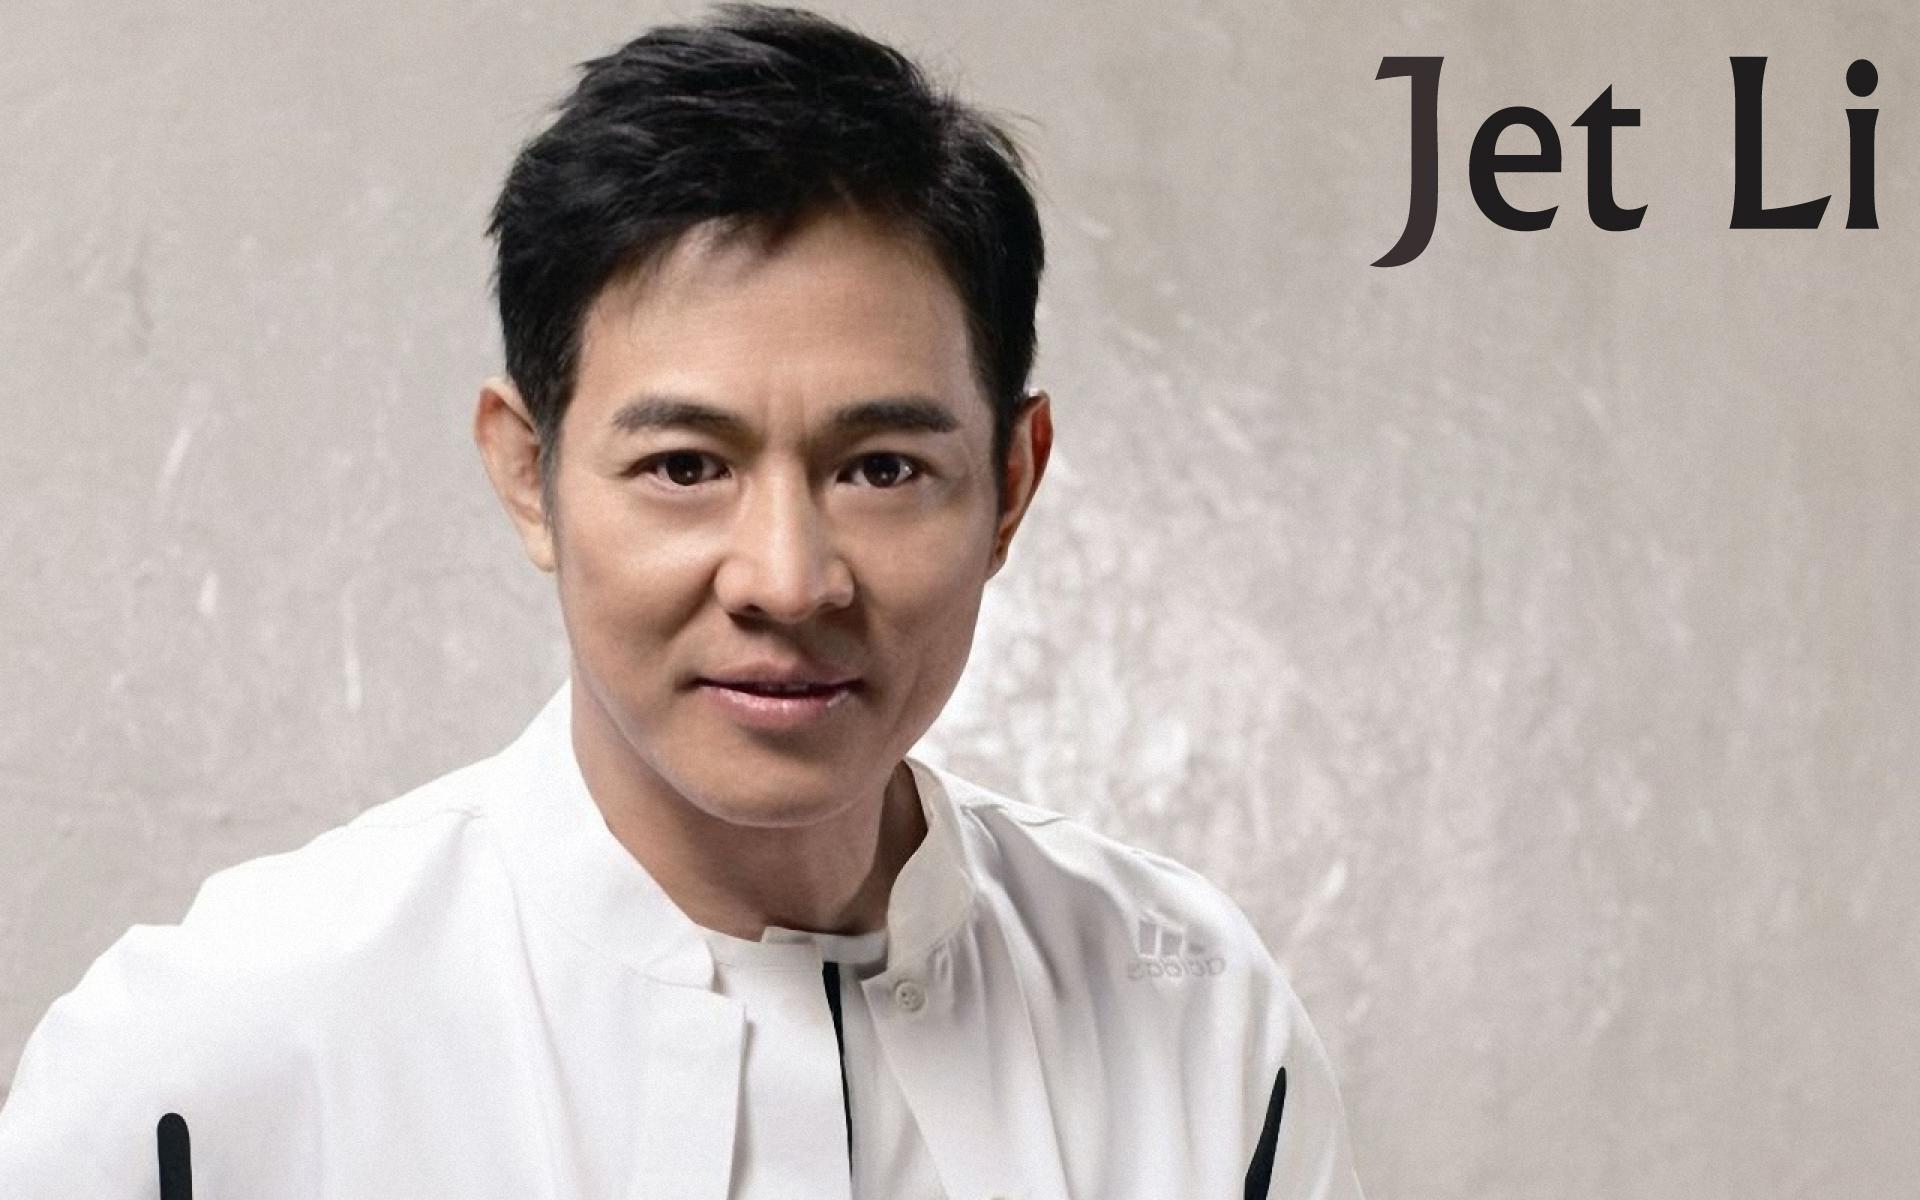 Jet Li Hd Background